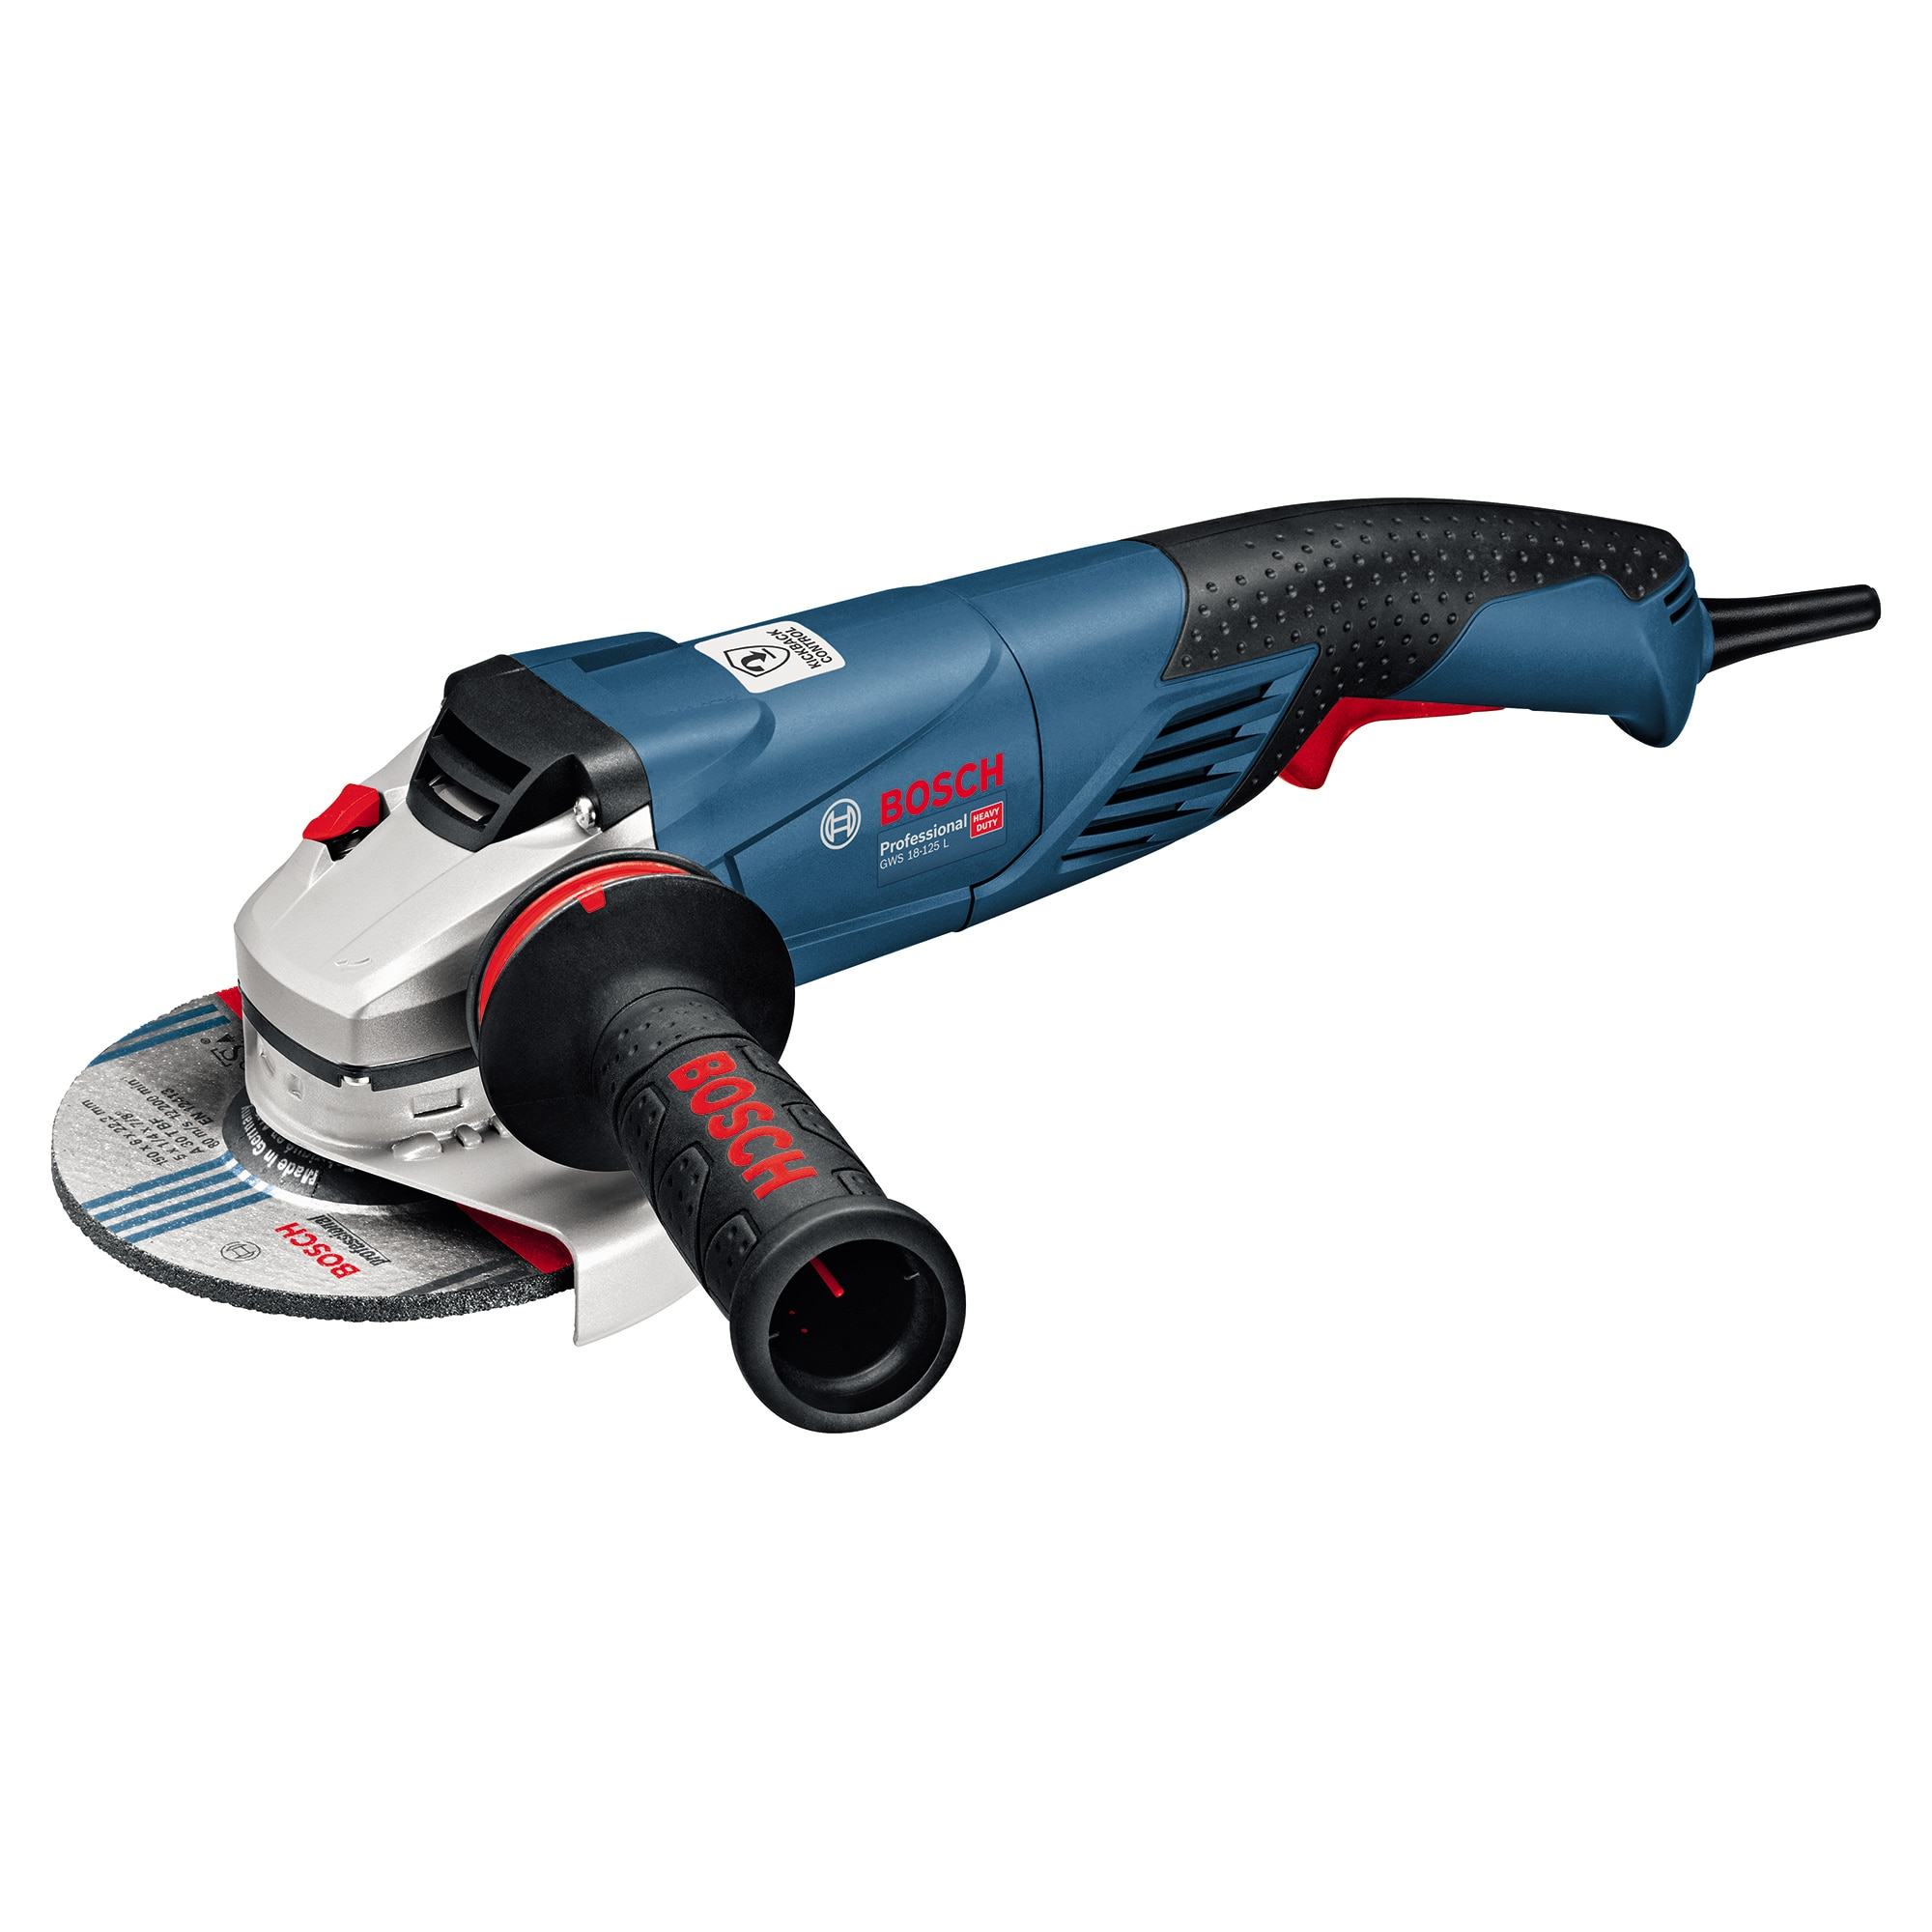 Fotografie Polizor unghiular Bosch Professional GWS 18-125 L, 1800 W, 11.500 RPM, 125 mm diametru disc, M 14 arbore de slefuit + piulita de strangere + flansa de prindere + aparatoare de protectie + maner suplimentar